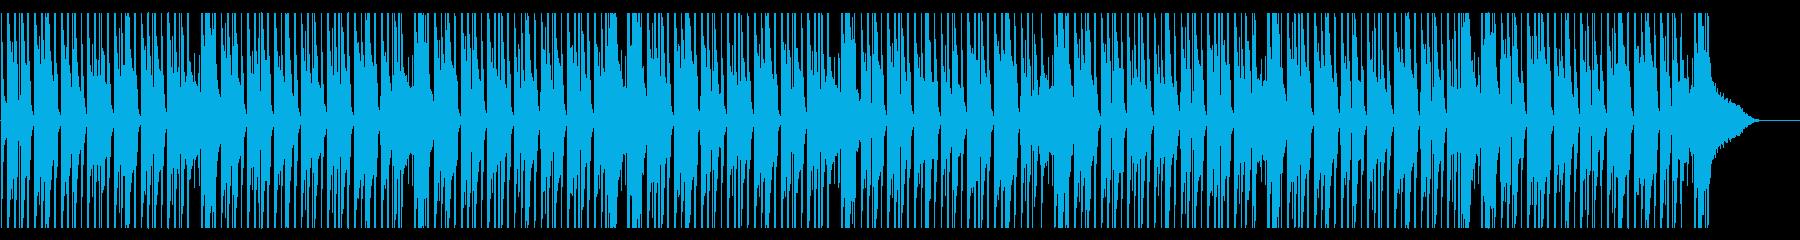 CMやアニメ系の日常(ハープ)の再生済みの波形